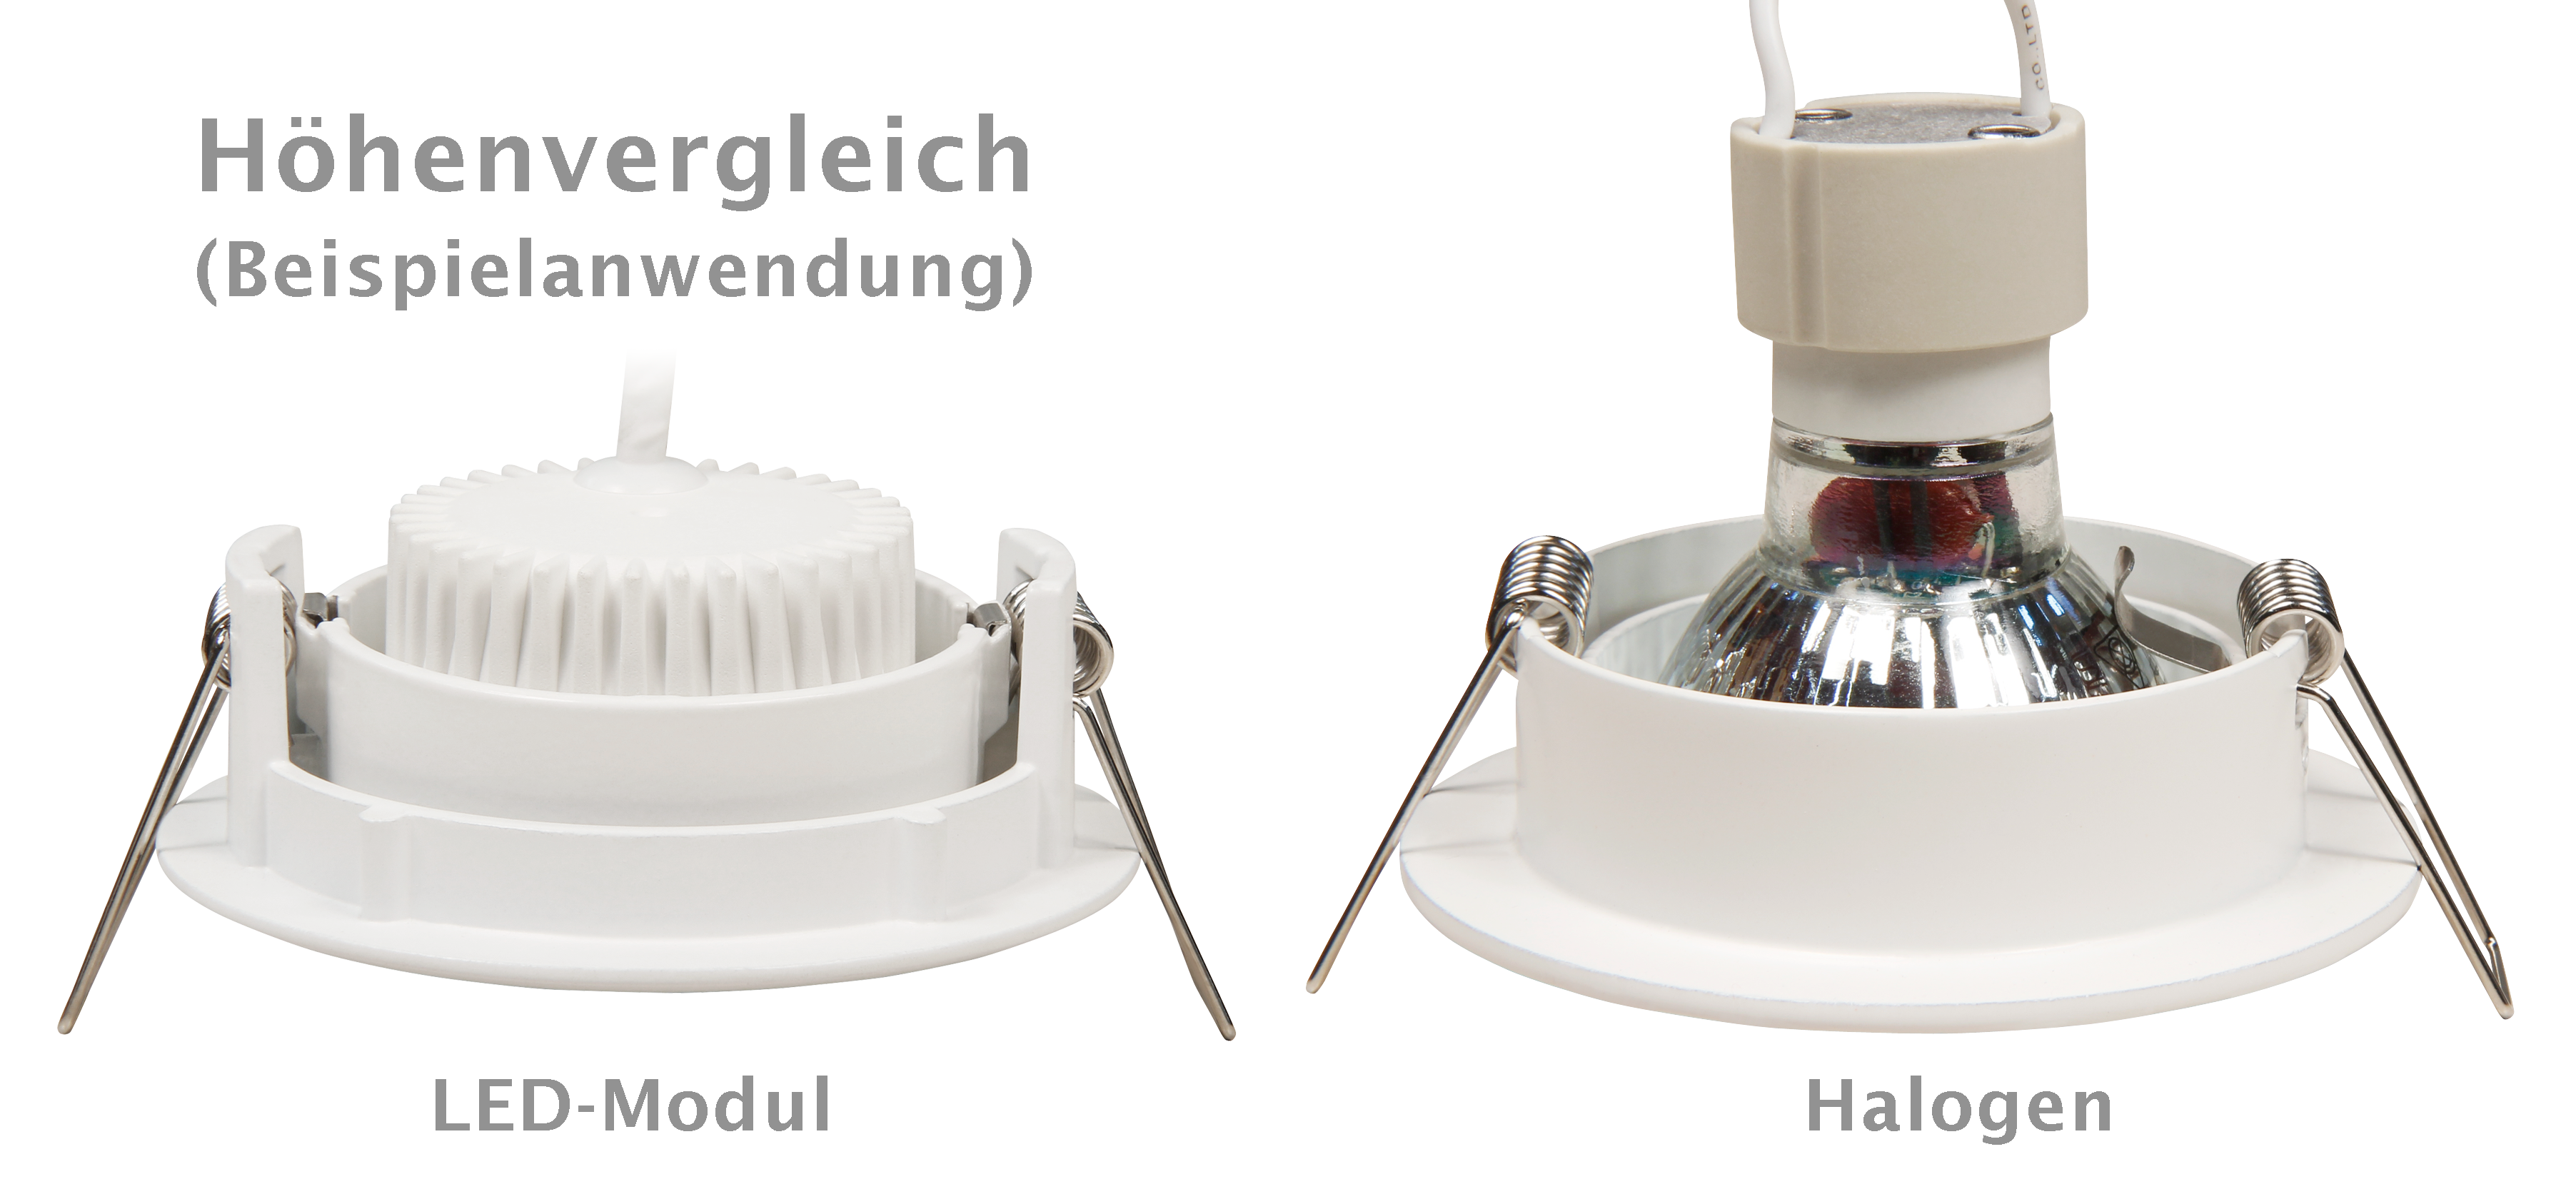 LED-Modul McShine ''MCOB'' 5W, 400lm, 230V, 50x25mm, neutralweiß, step-dimmbar